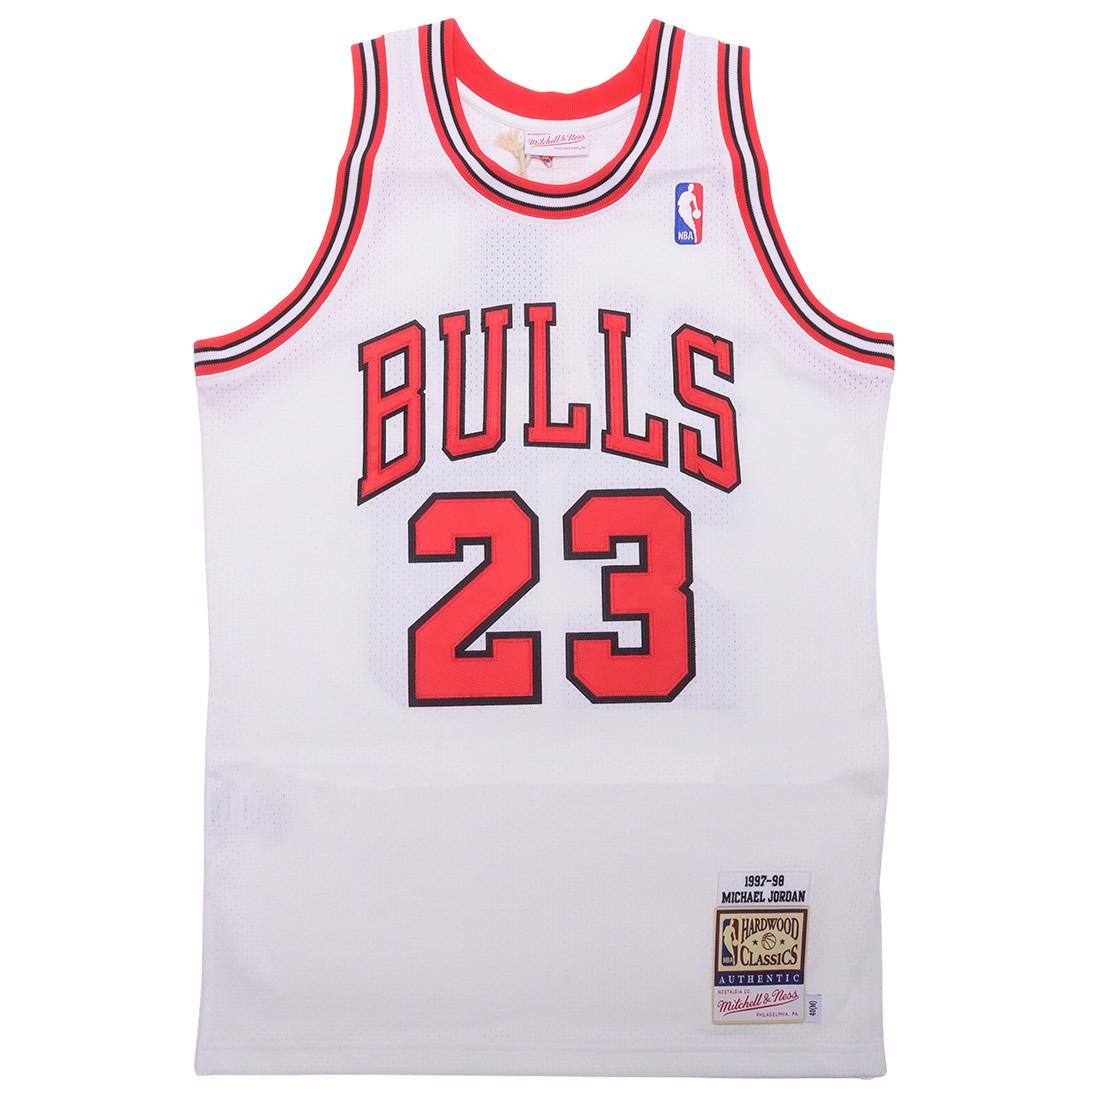 Mitchell And Ness x NBA Men Chicago Bulls Michael Jordan Jersey - Home 97 (white)